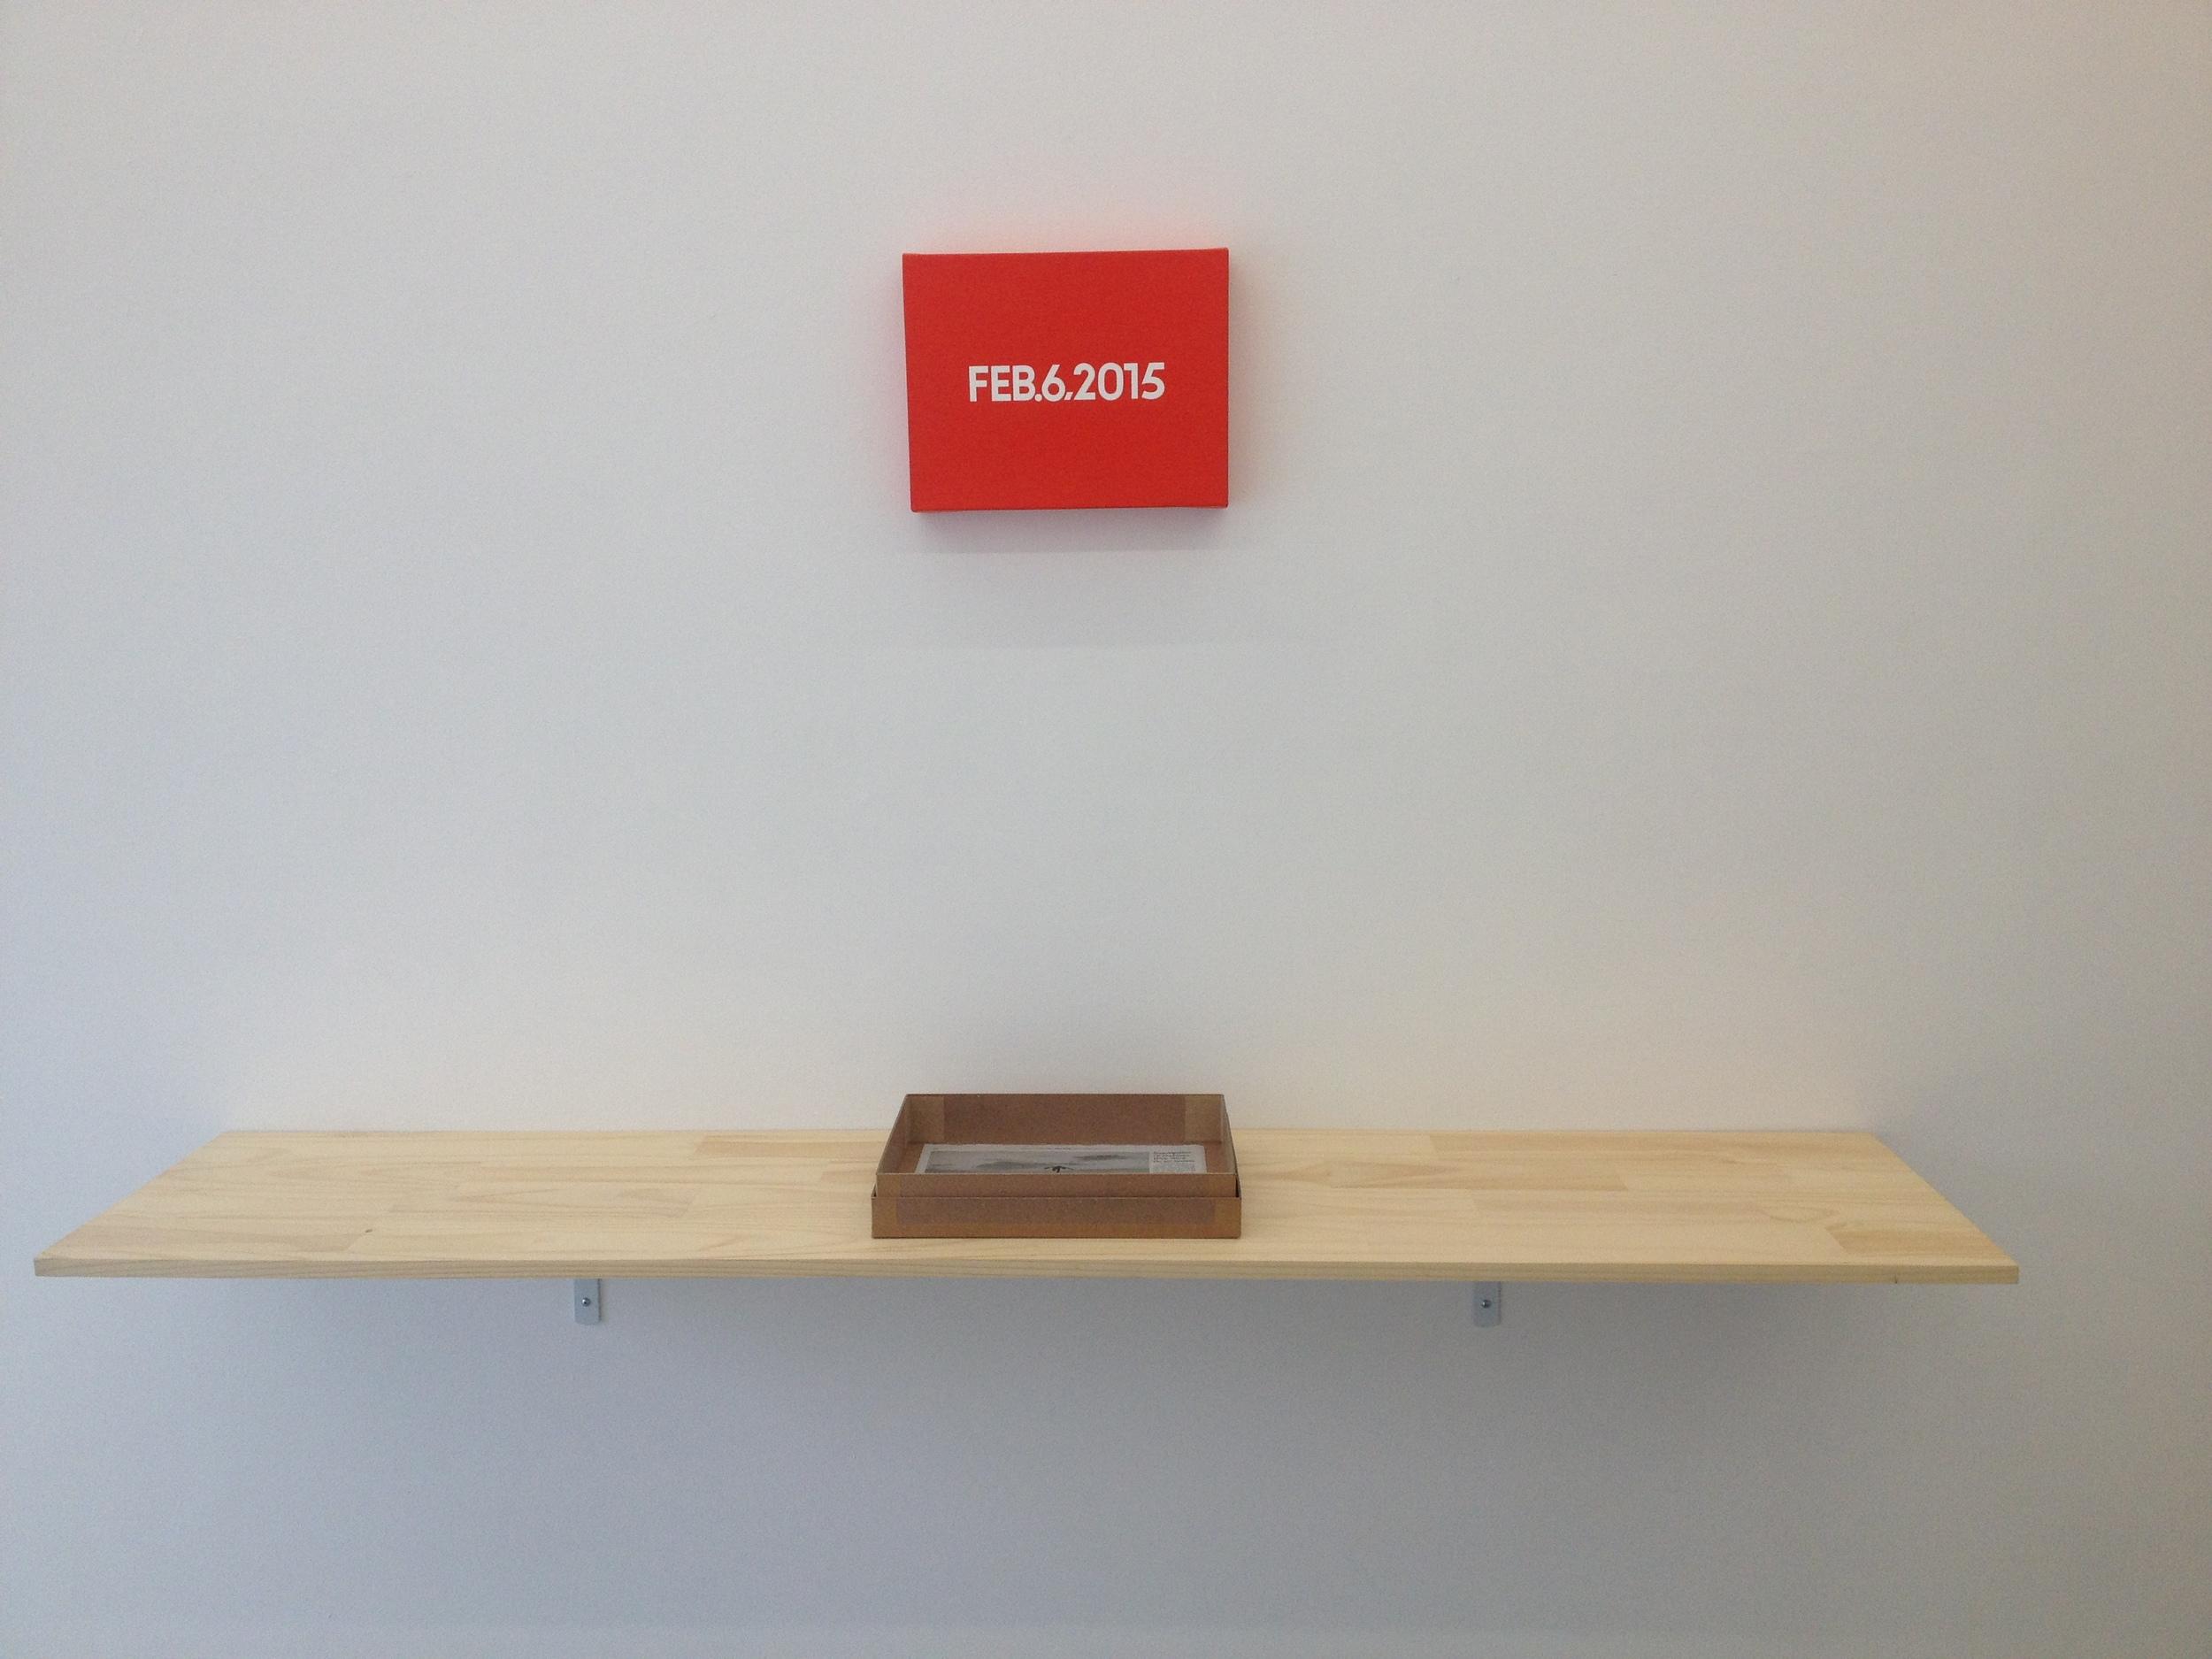 ERIC_FEB6_with shelf.JPG